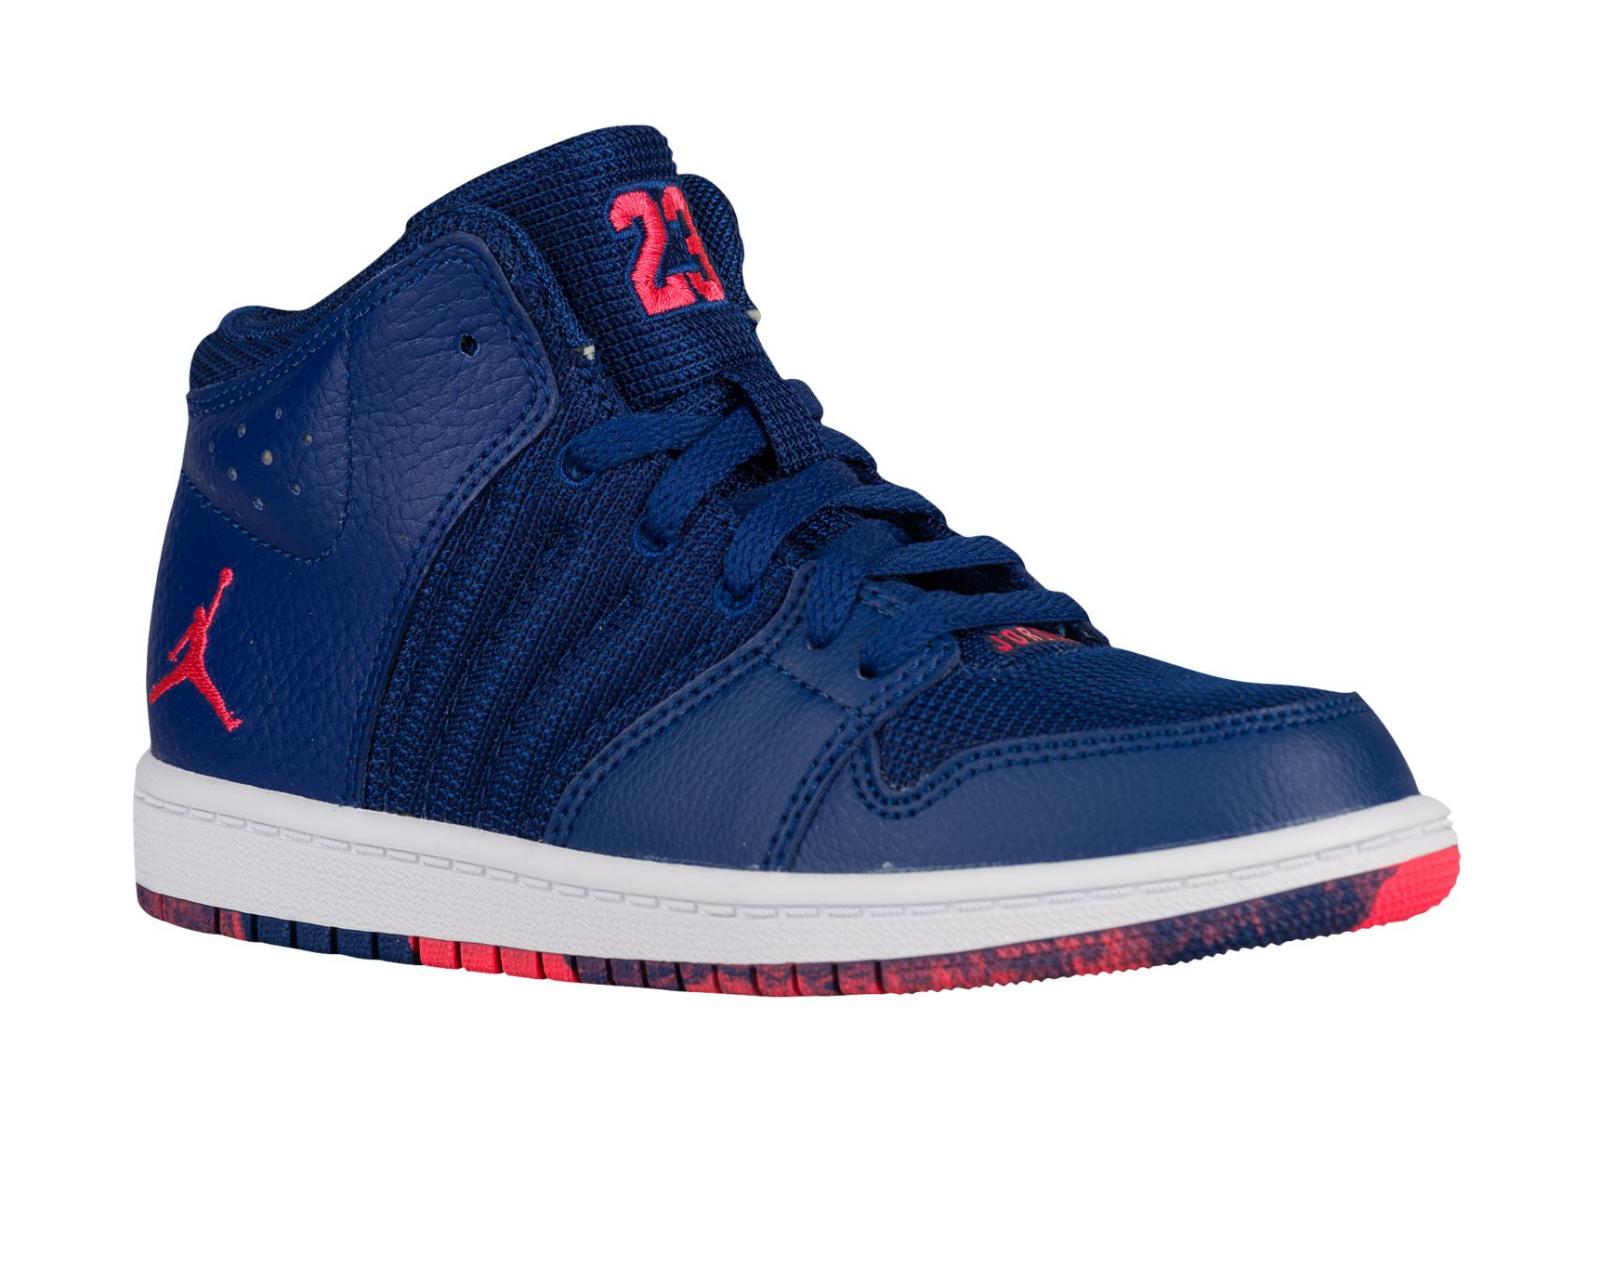 hot sale online 09776 2f631 Nike Air Jordan 1 Flight 4 Prem 828237 461 and 11 similar items